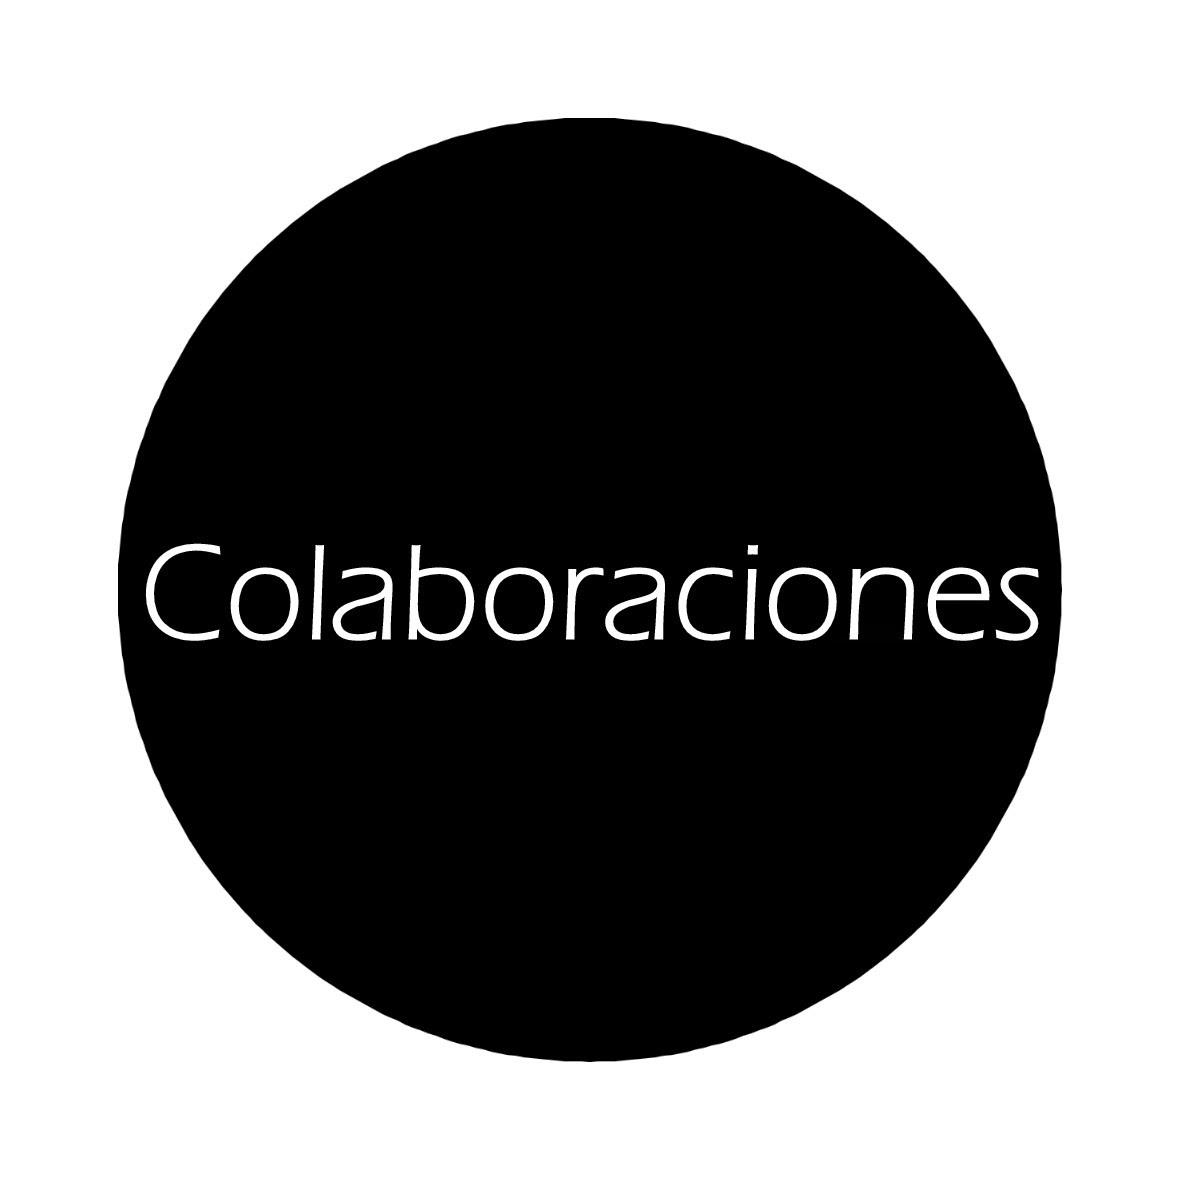 http://javierlopezromero.blogspot.com.es/p/colaboraciones.html